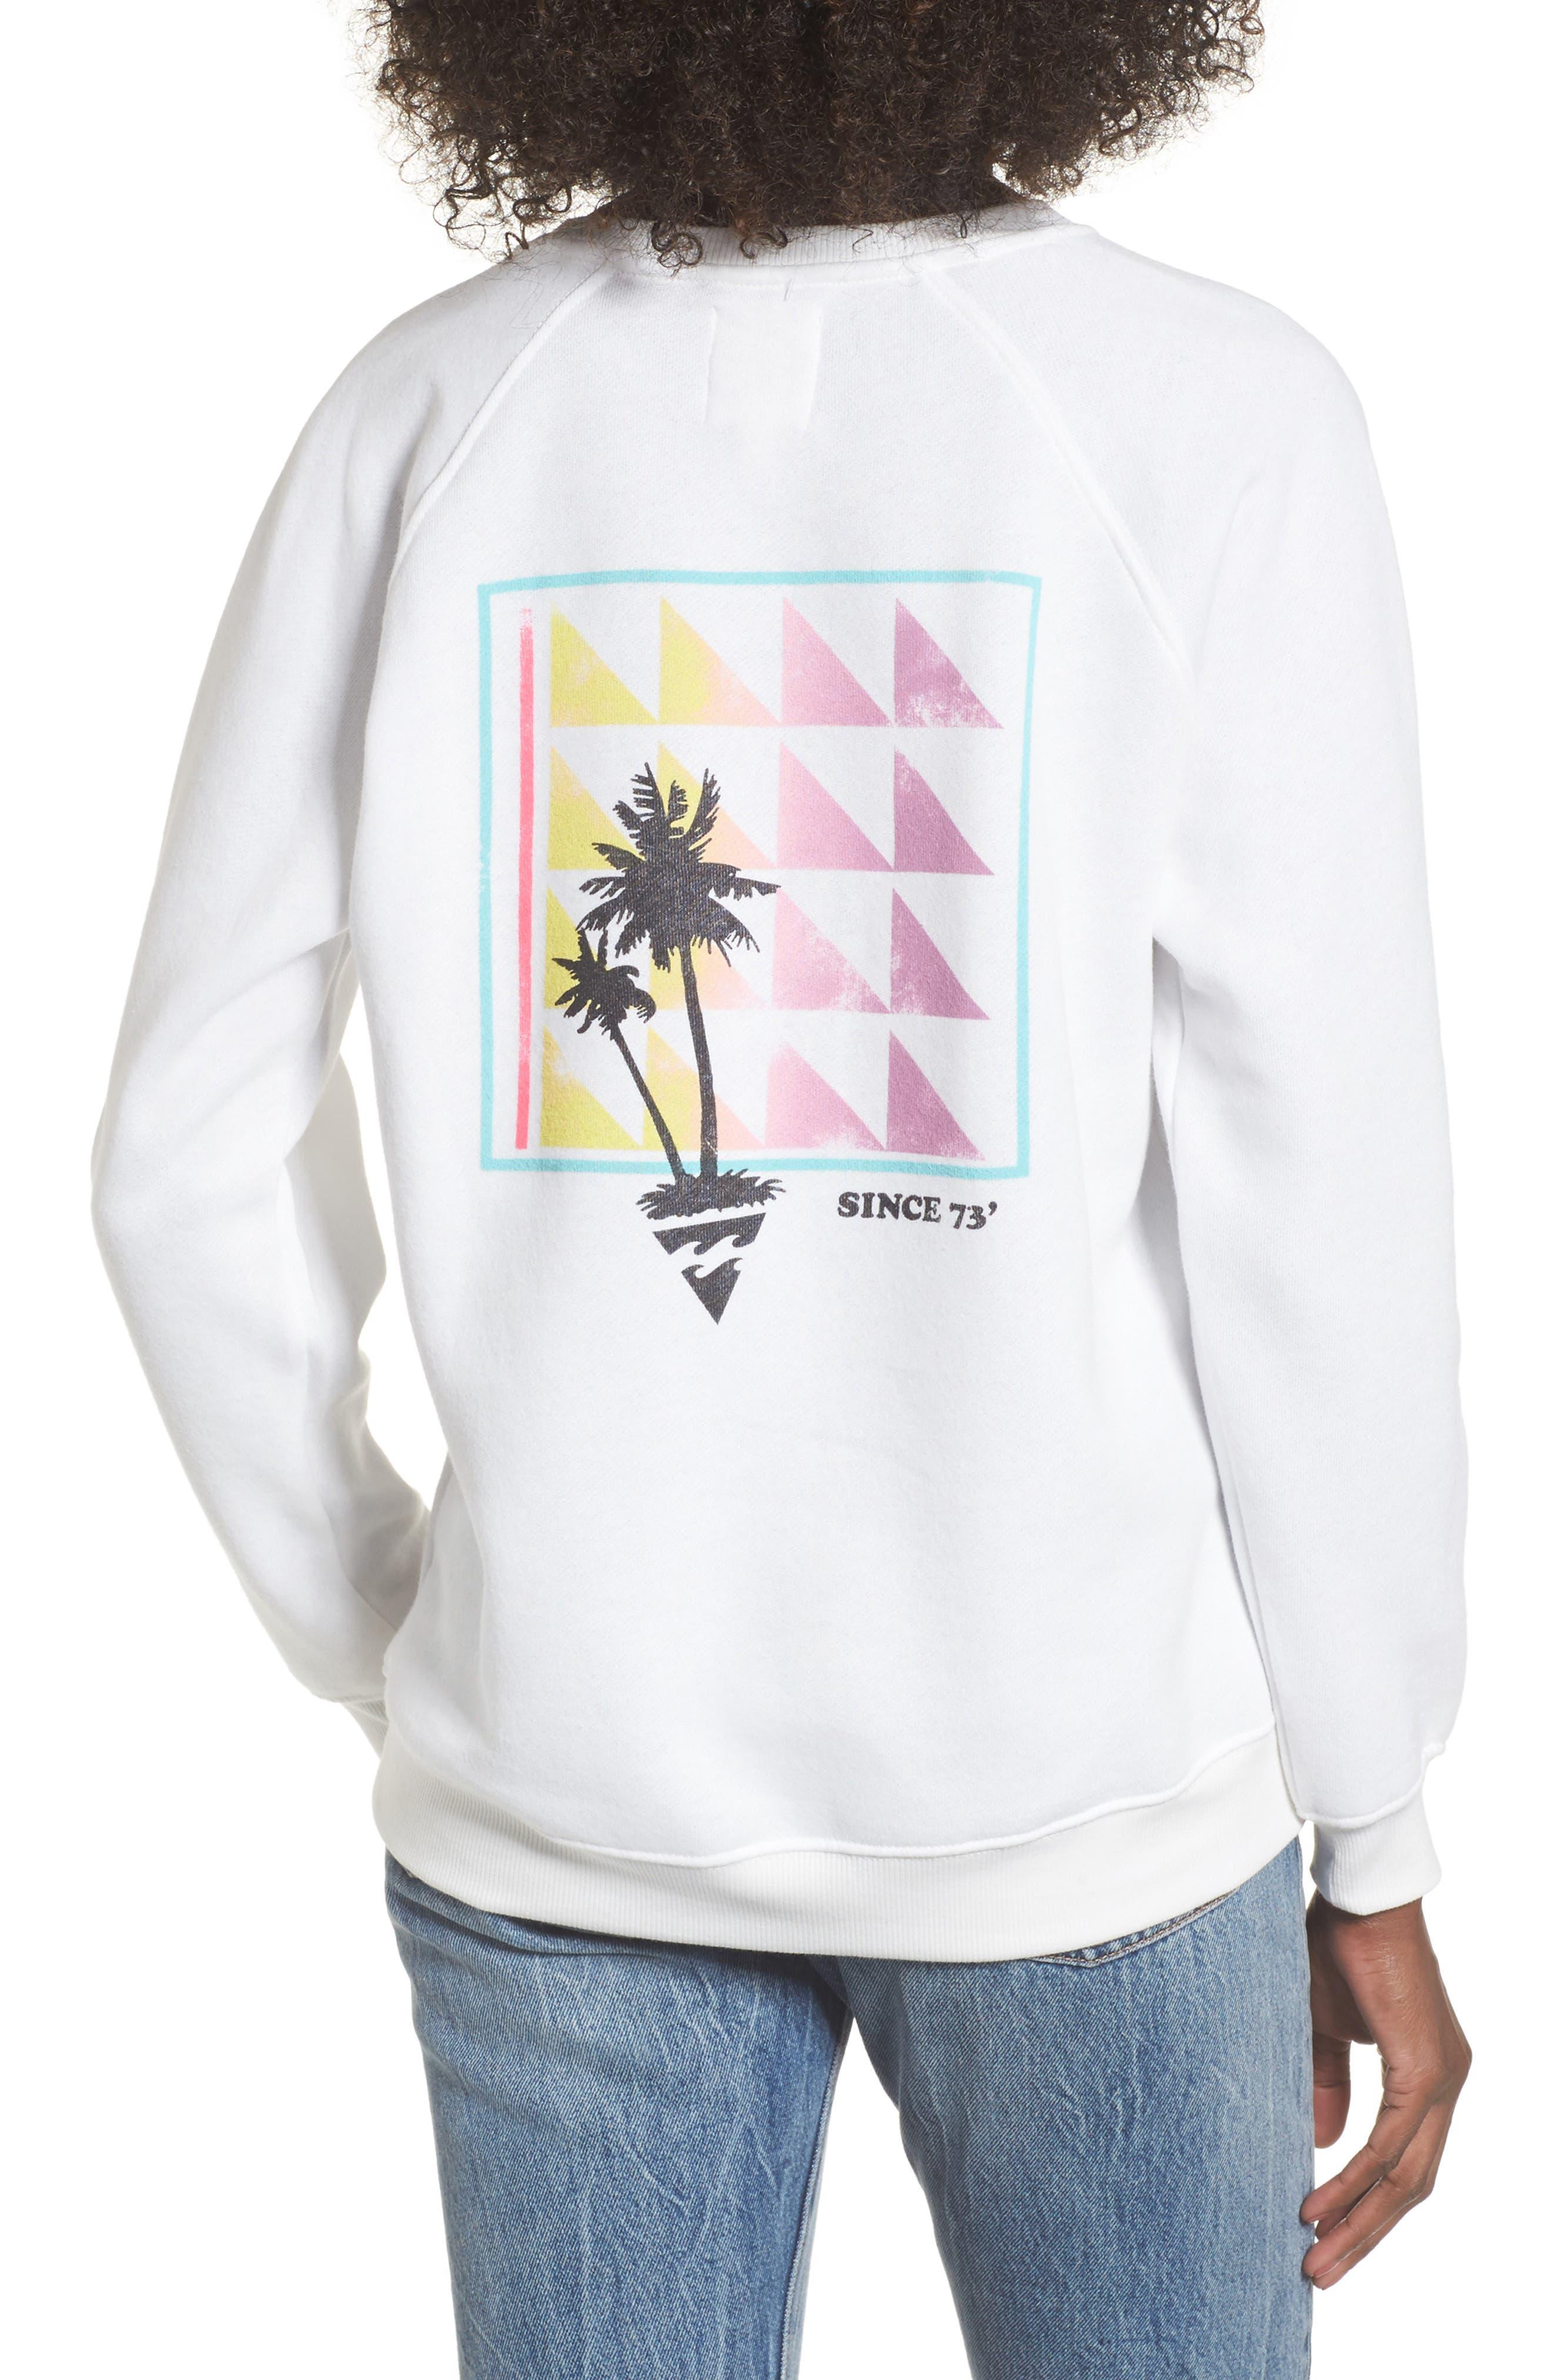 Since '73 Sweatshirt,                             Alternate thumbnail 2, color,                             190